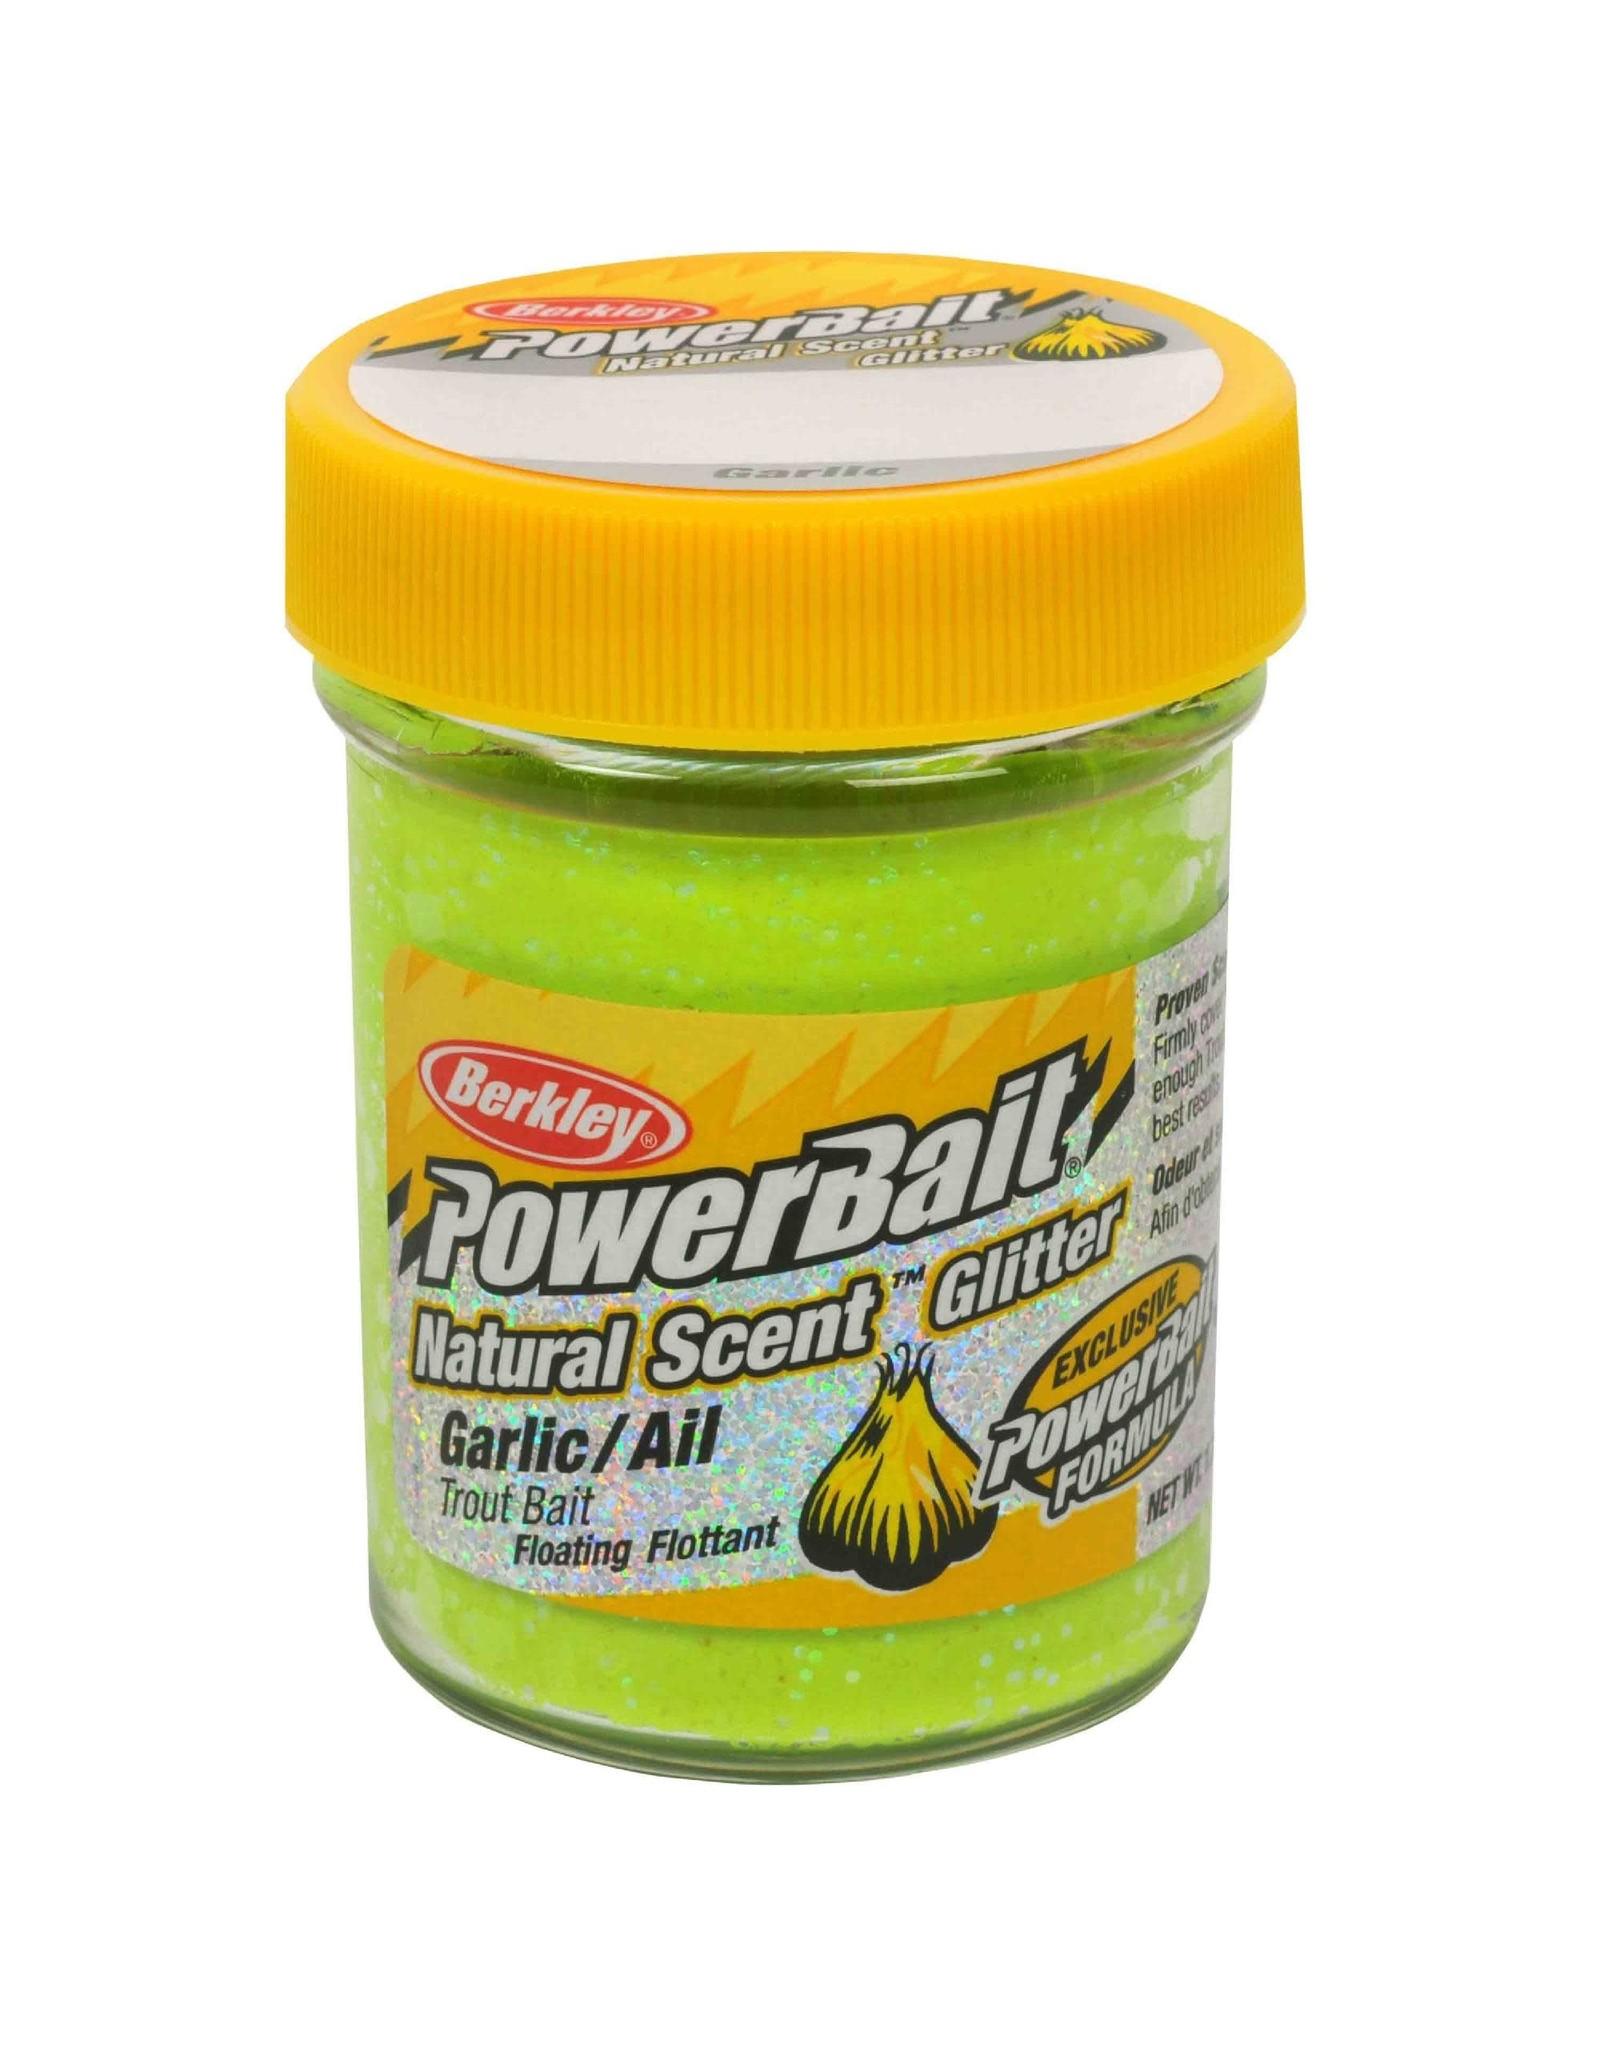 Berkley Power Bait Trout Bait - Chartreuse Garlic